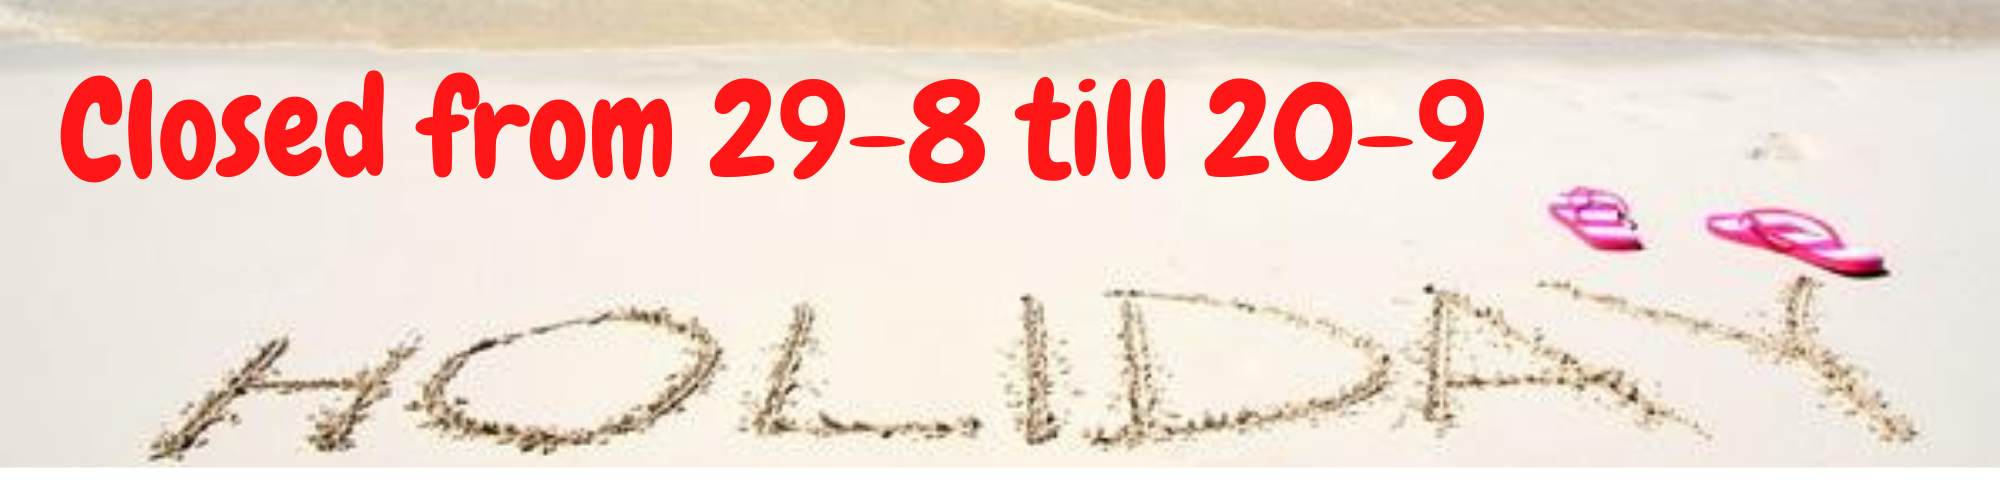 Stuff4Pets Online Dierenwinkel- Verrassend Voordeling banner 1